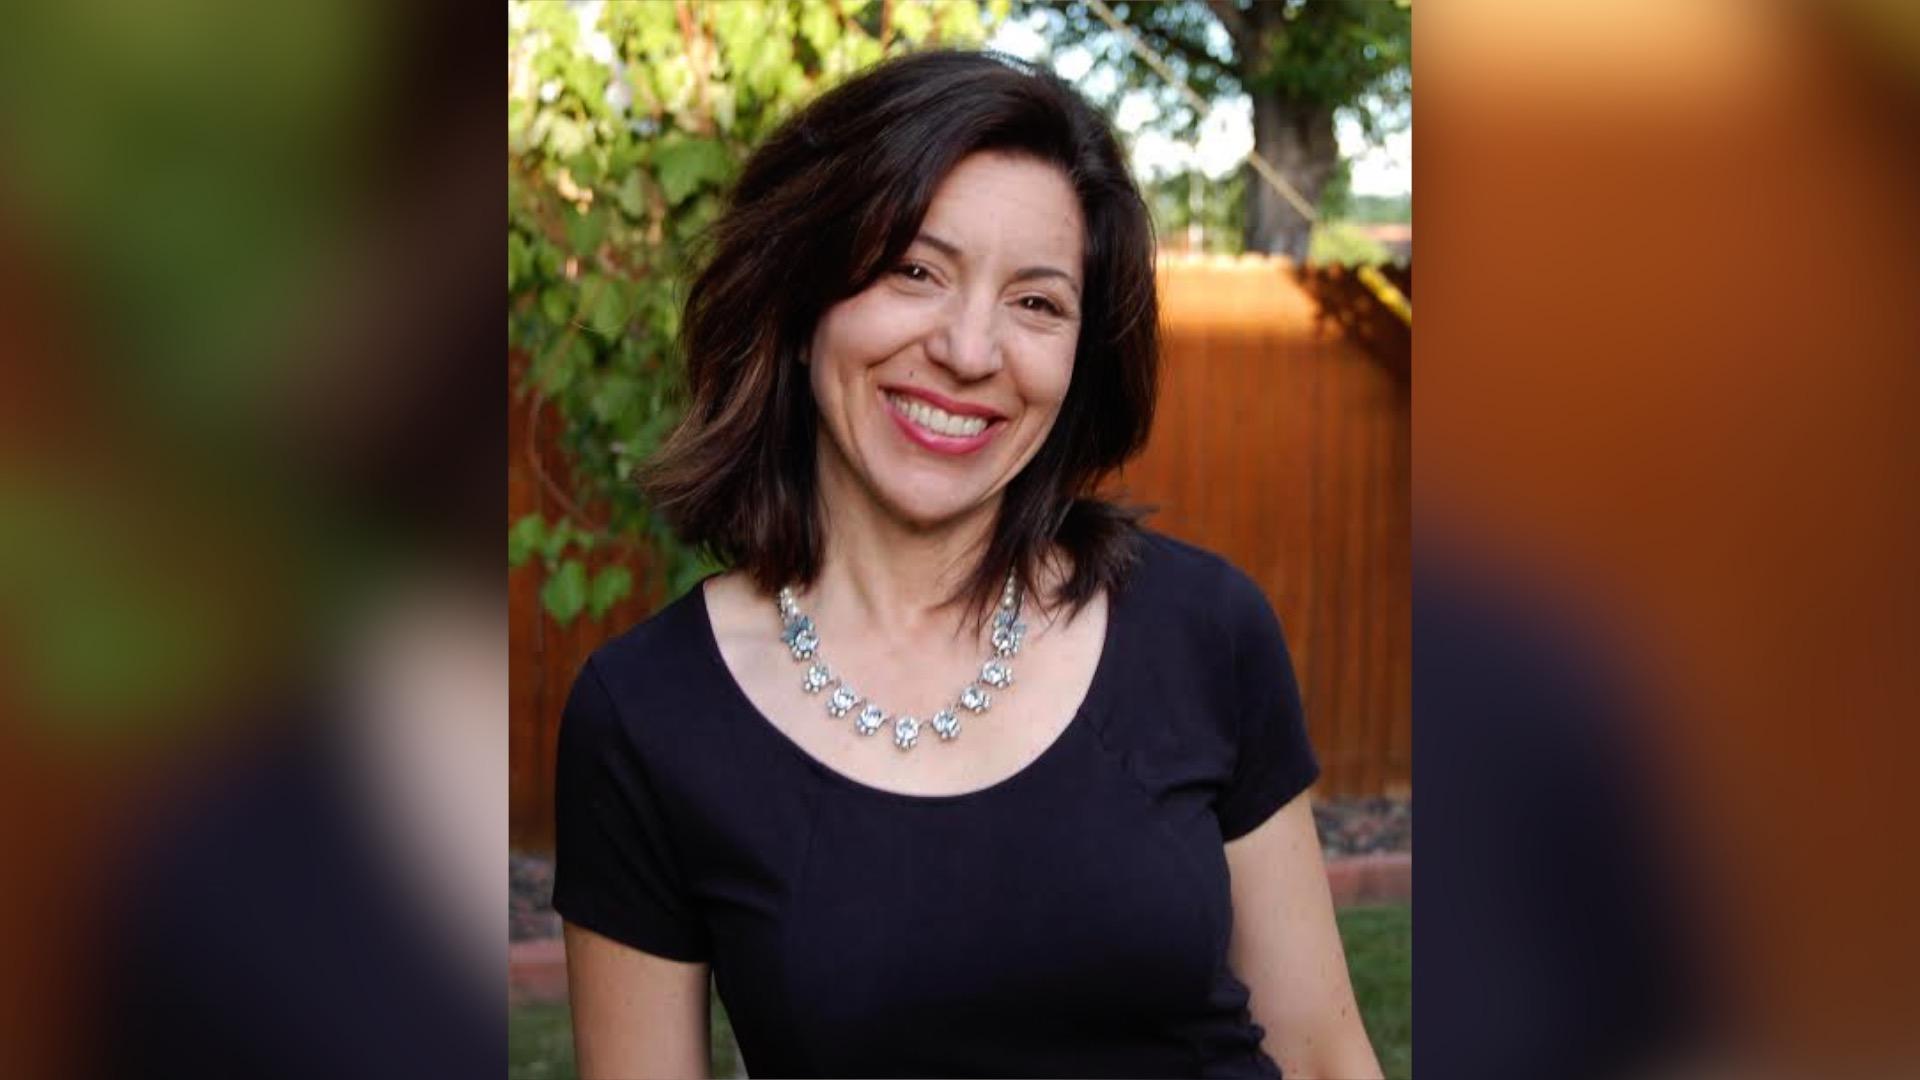 Priscilla Hopskins smiles, posing for a photo outdoors